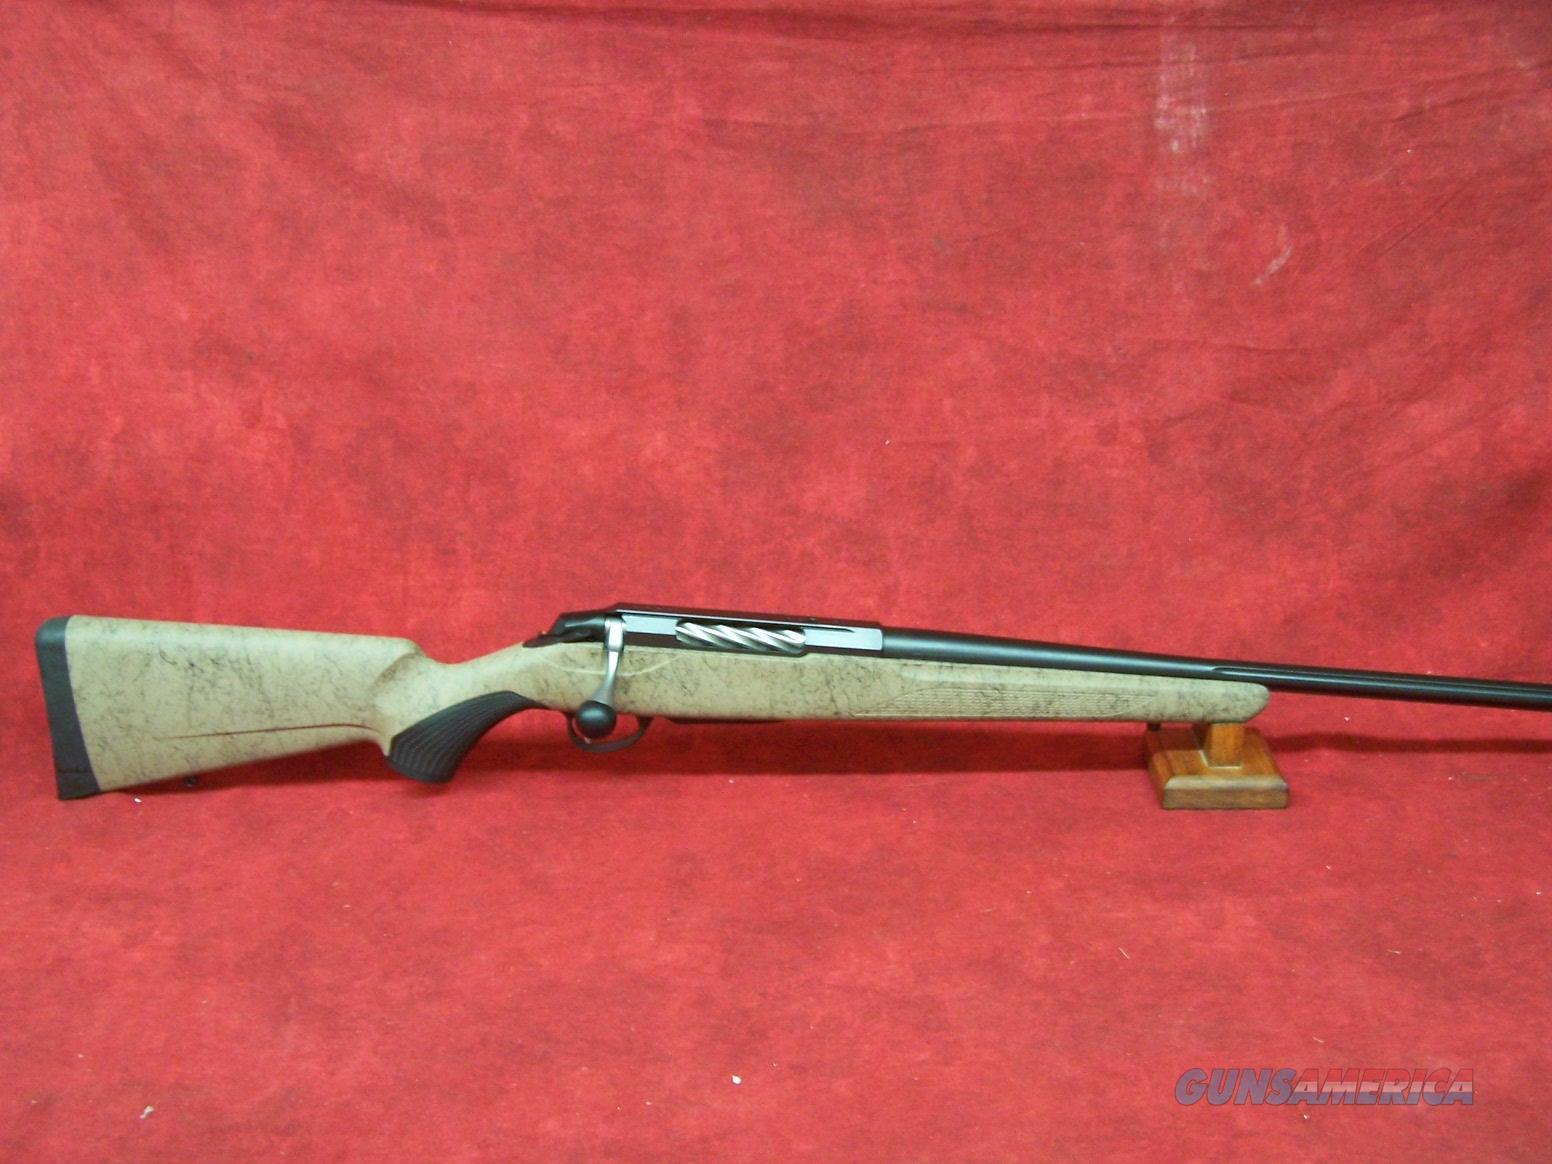 "TIKKA T3X LITE 6.5CREEDMOOR ROUGHTECH TAN  24"" TB (JRTXRT382)  Guns > Rifles > Tikka Rifles > T3"